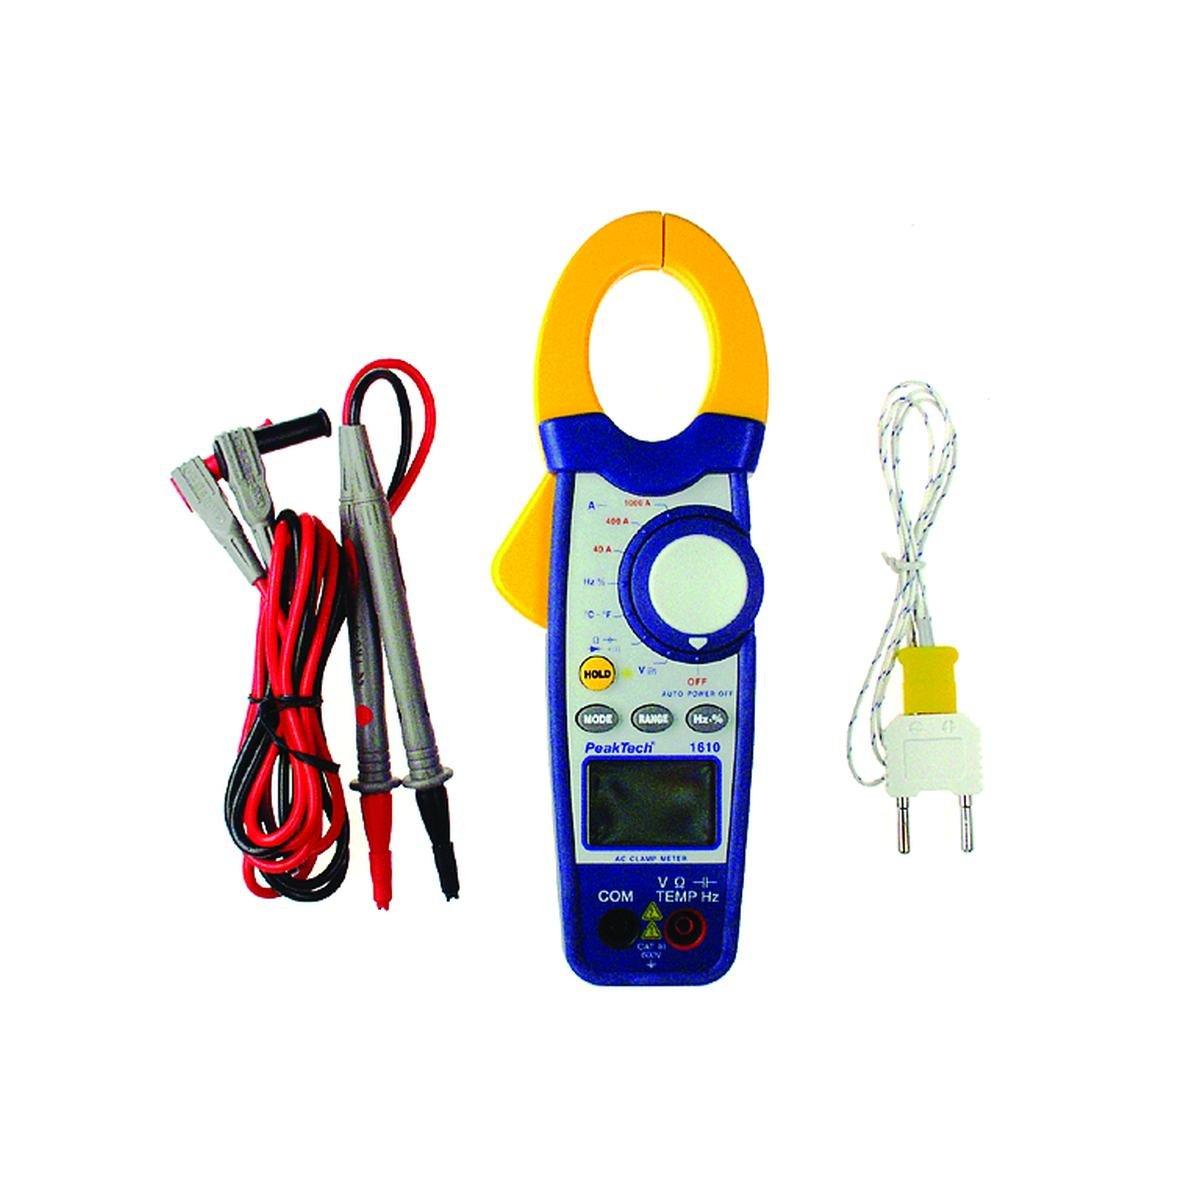 Digital tangamperemeter - Europart